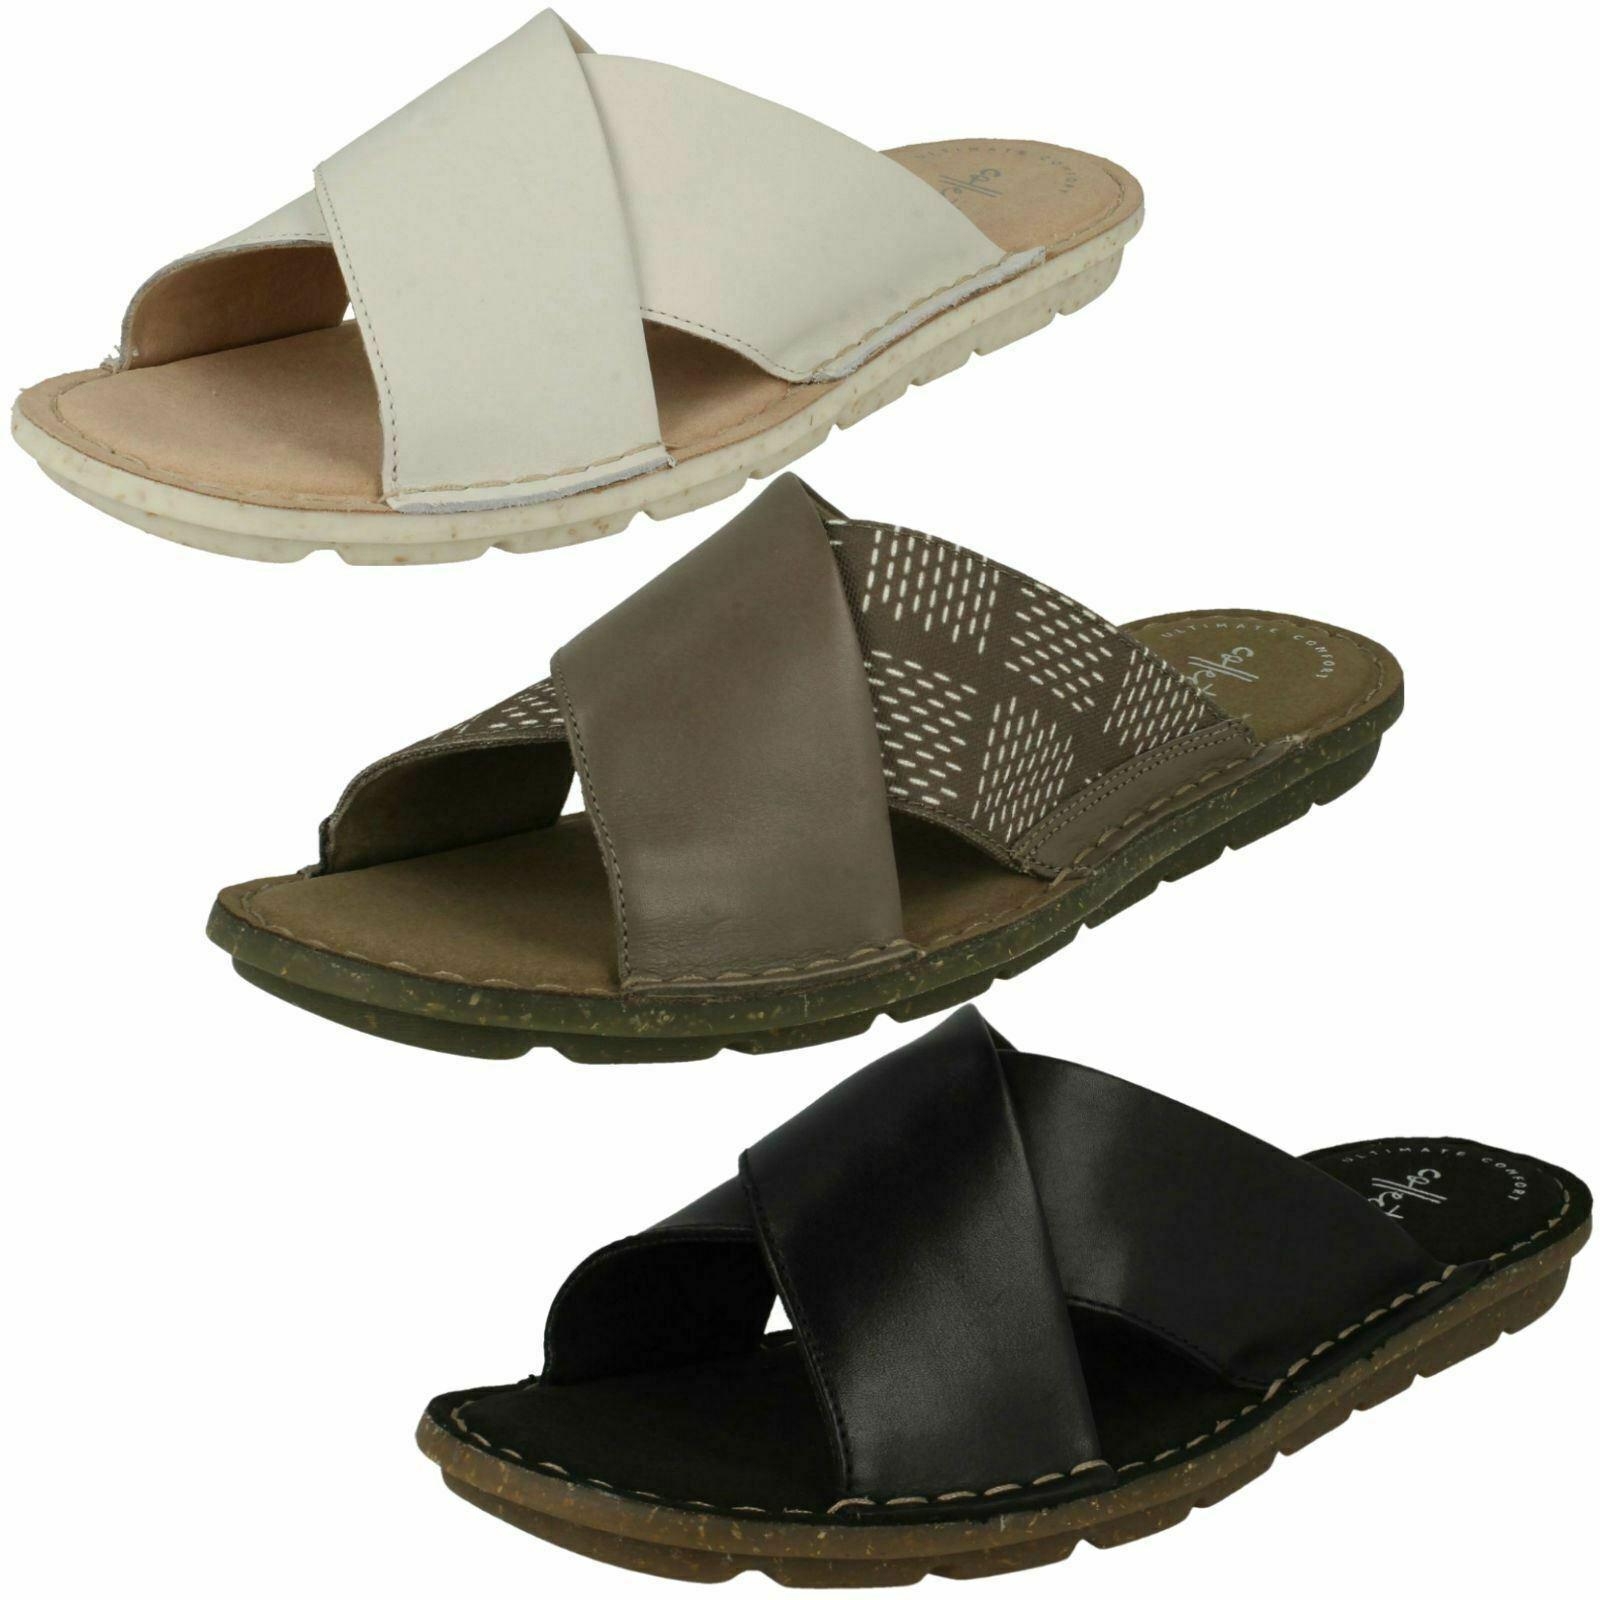 Clarks Blake Sydney Mule Sandals